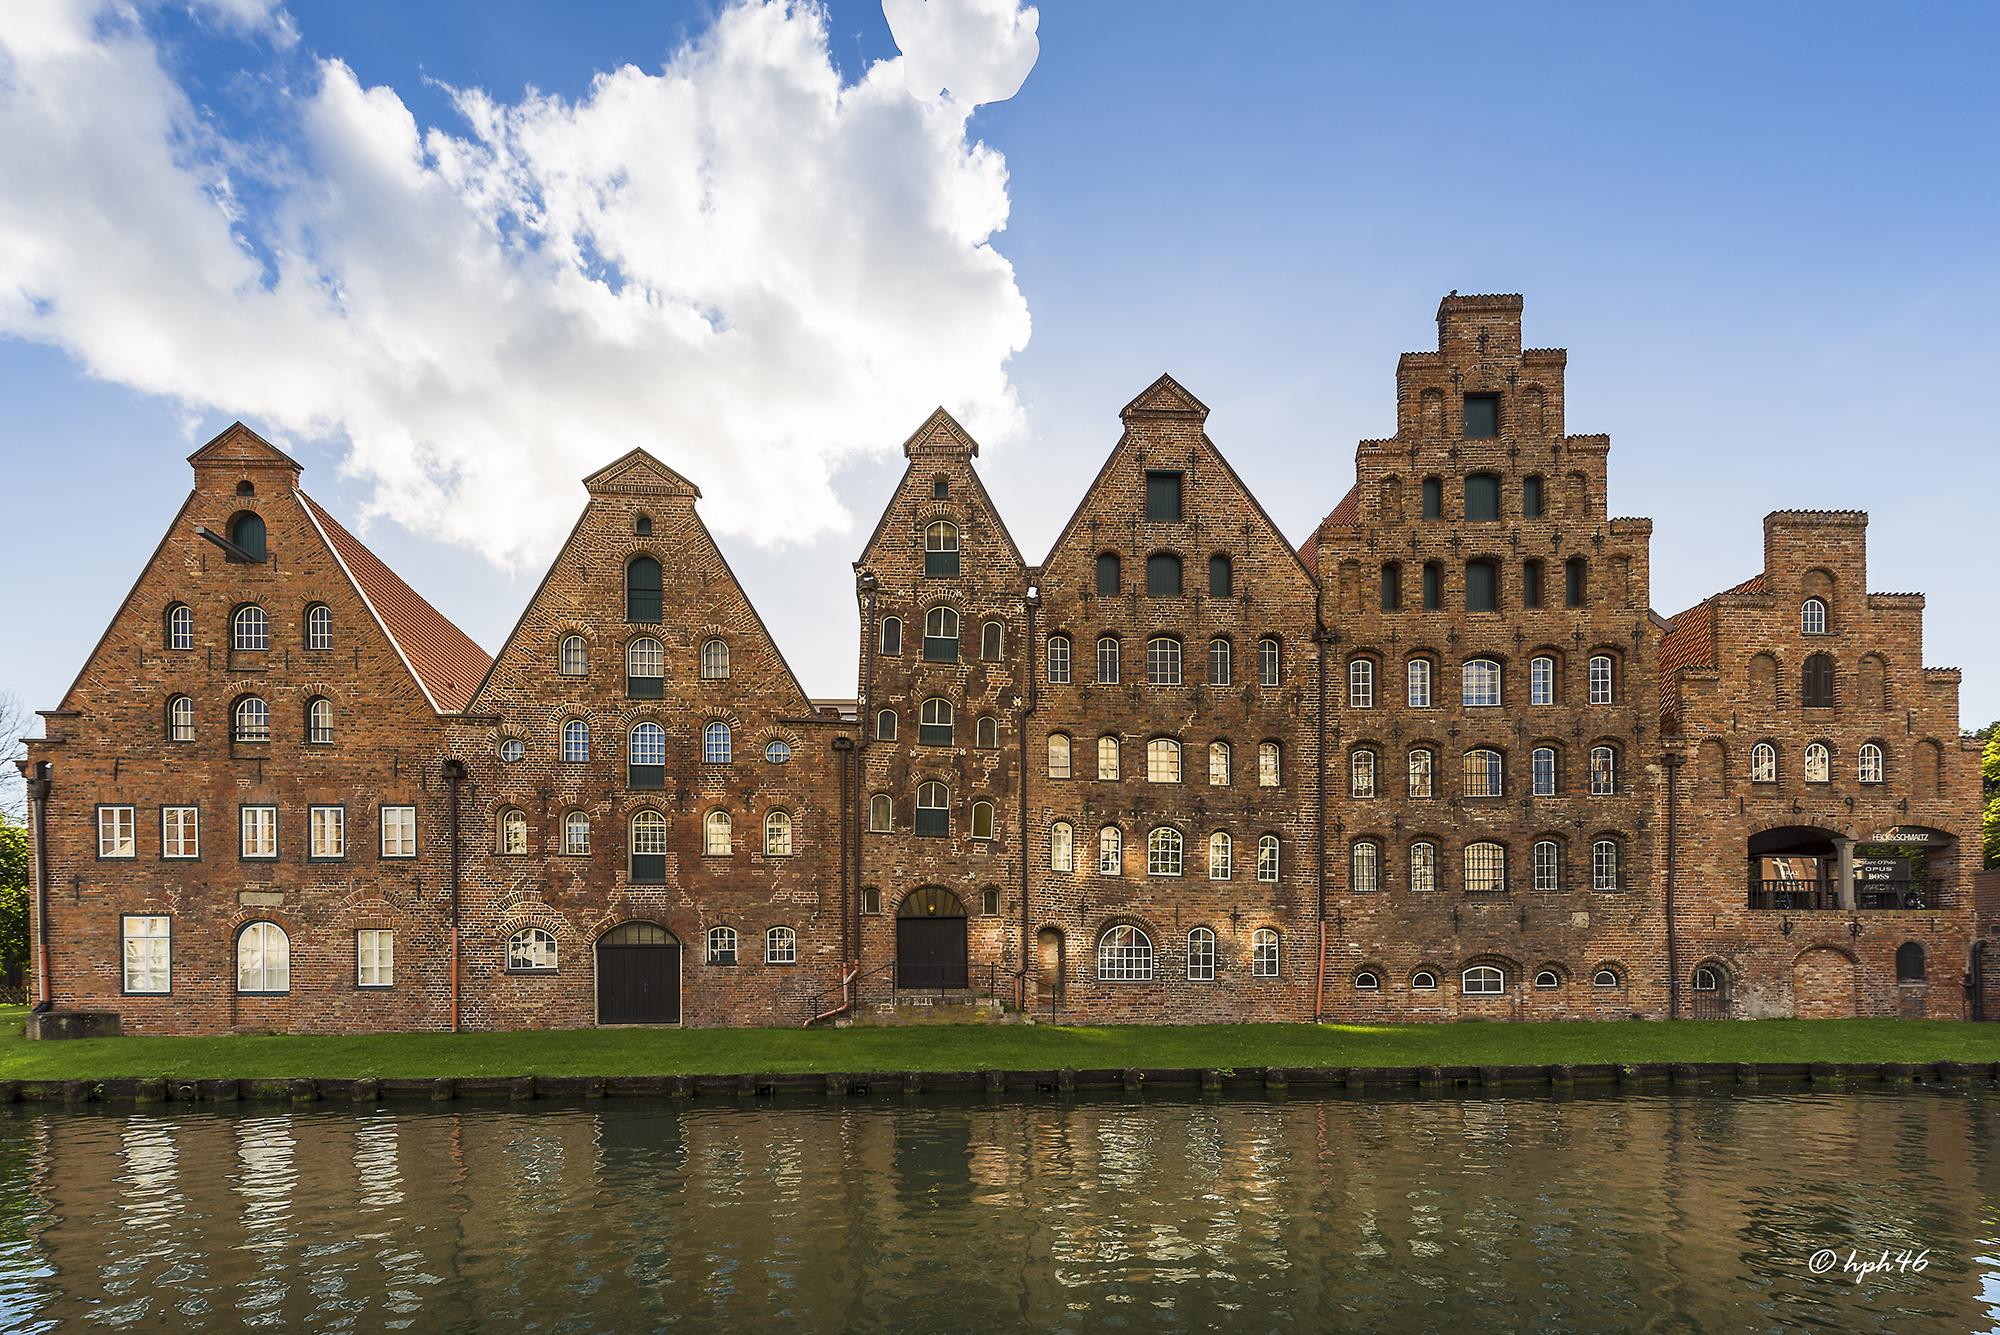 Salzspeicher Lübeck, Germany